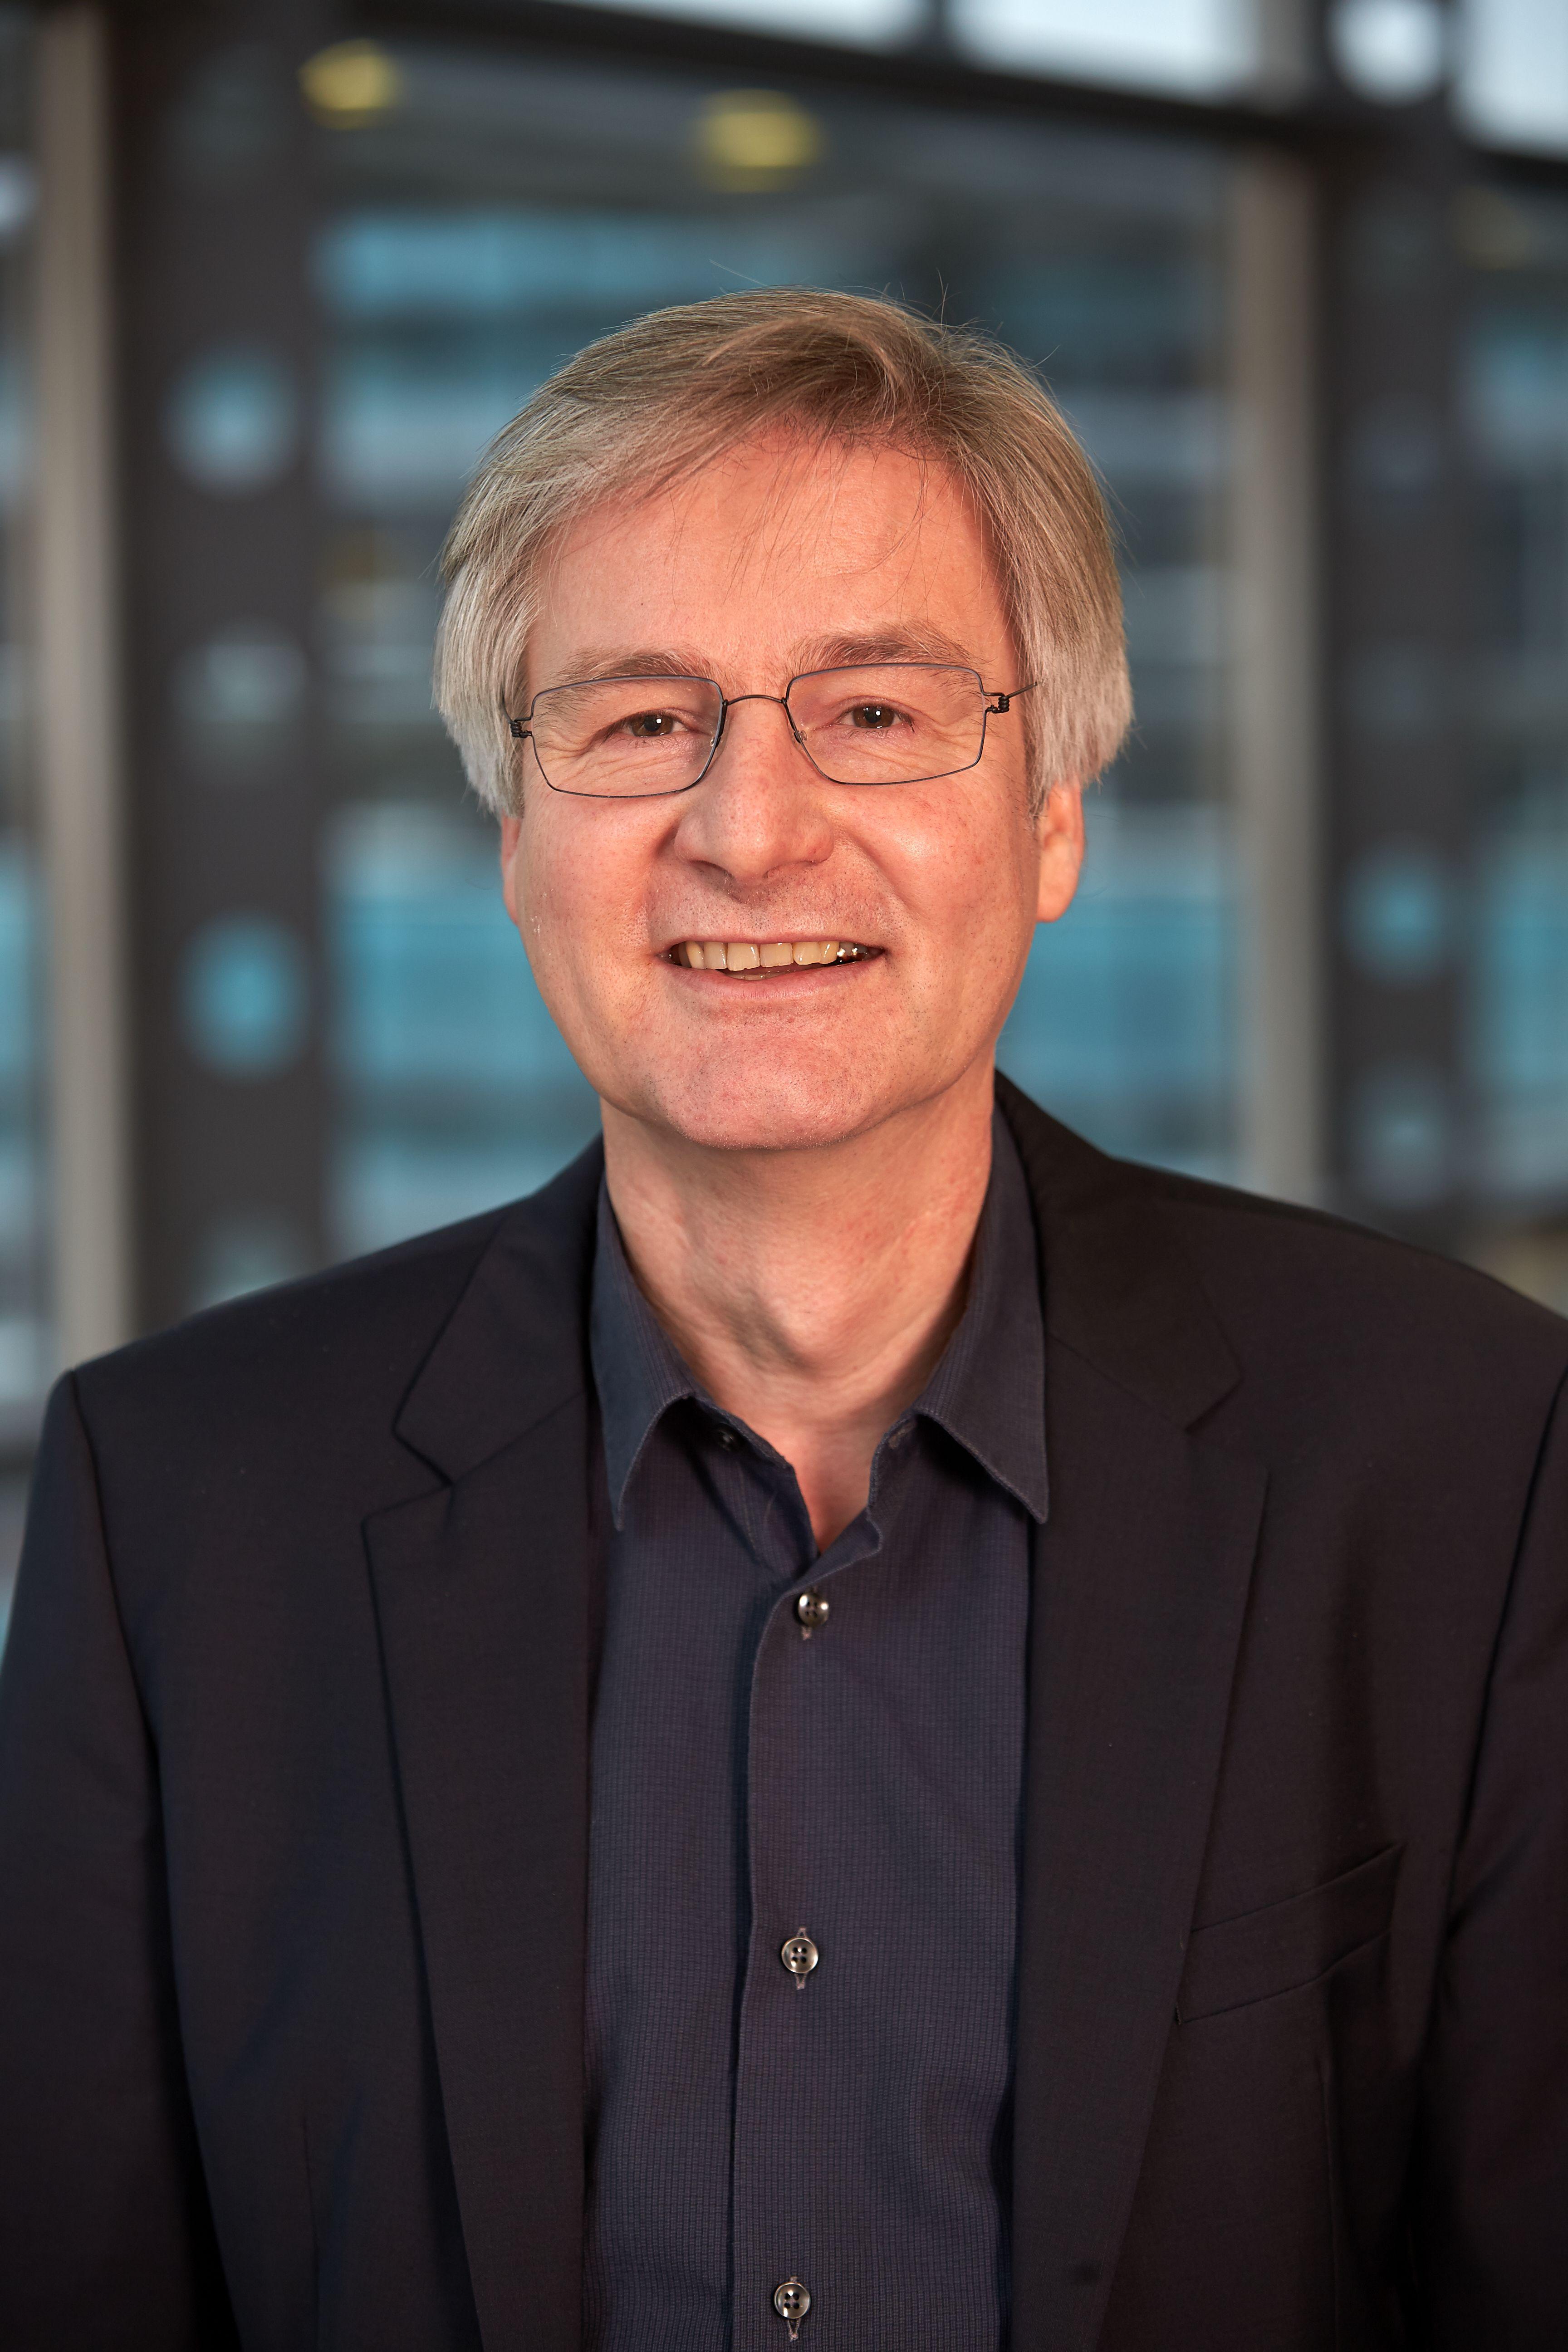 Prof. Dr. Stephan Bundschuh